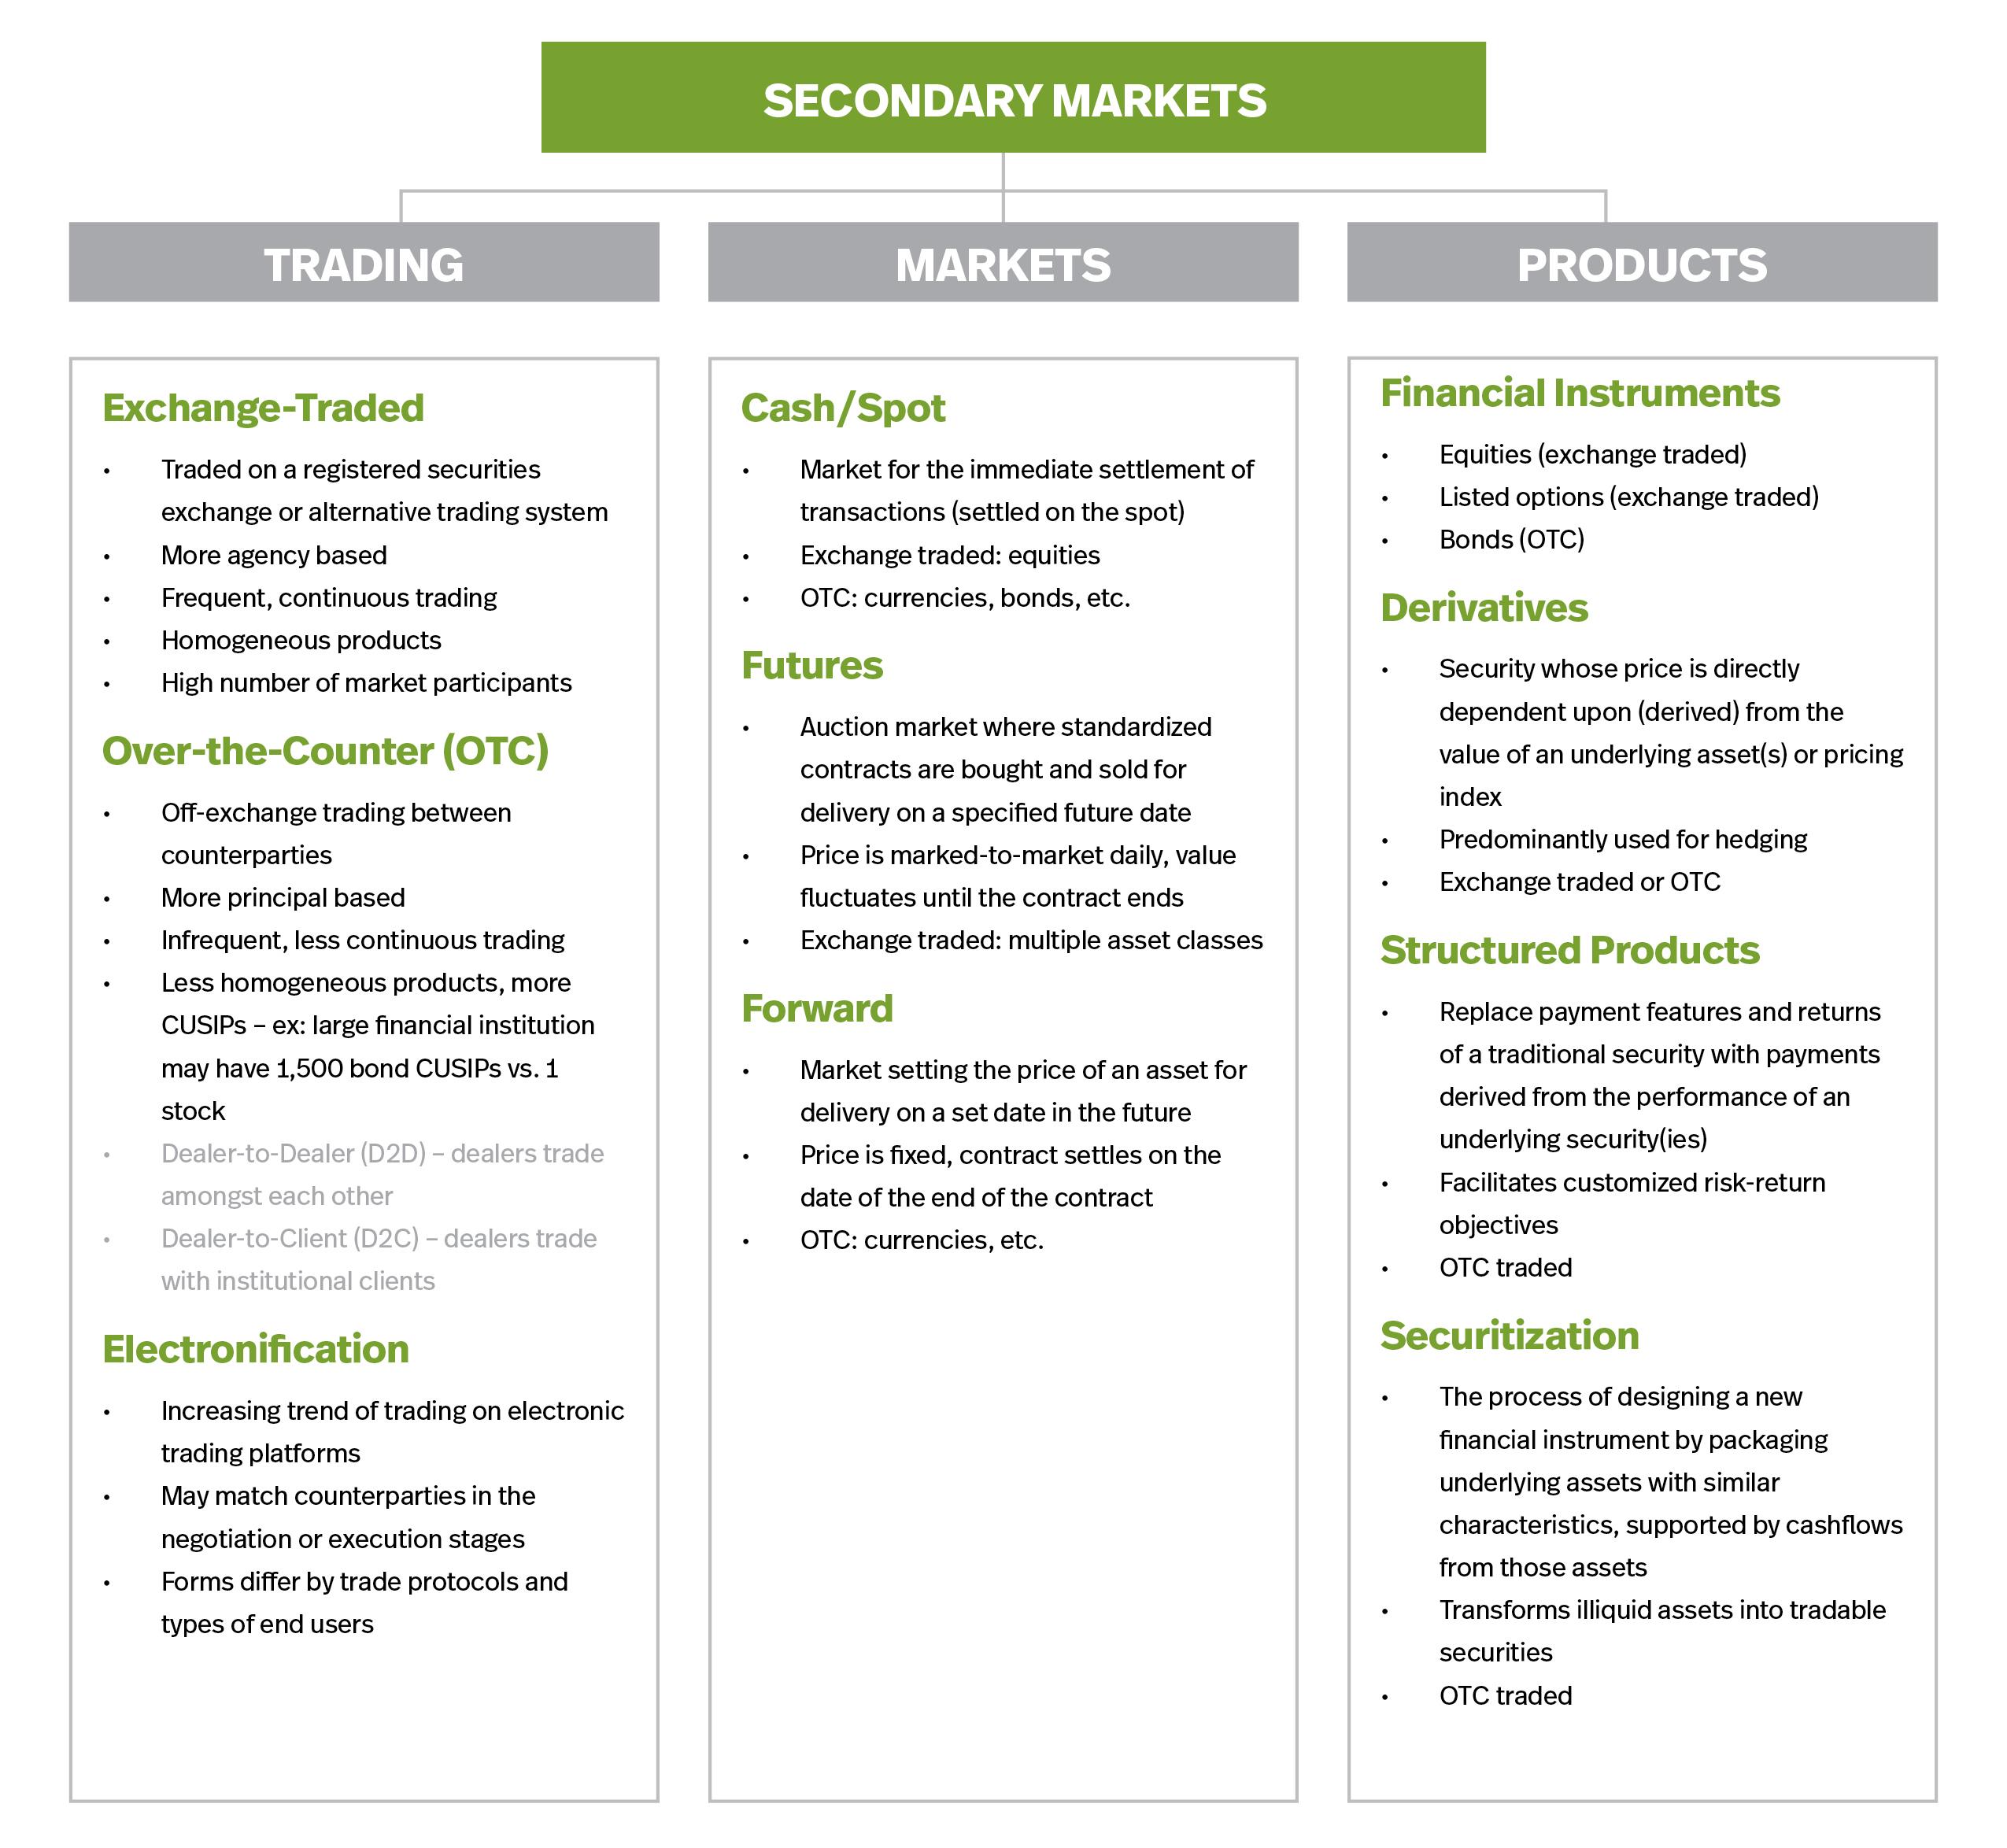 SecondaryMarkets